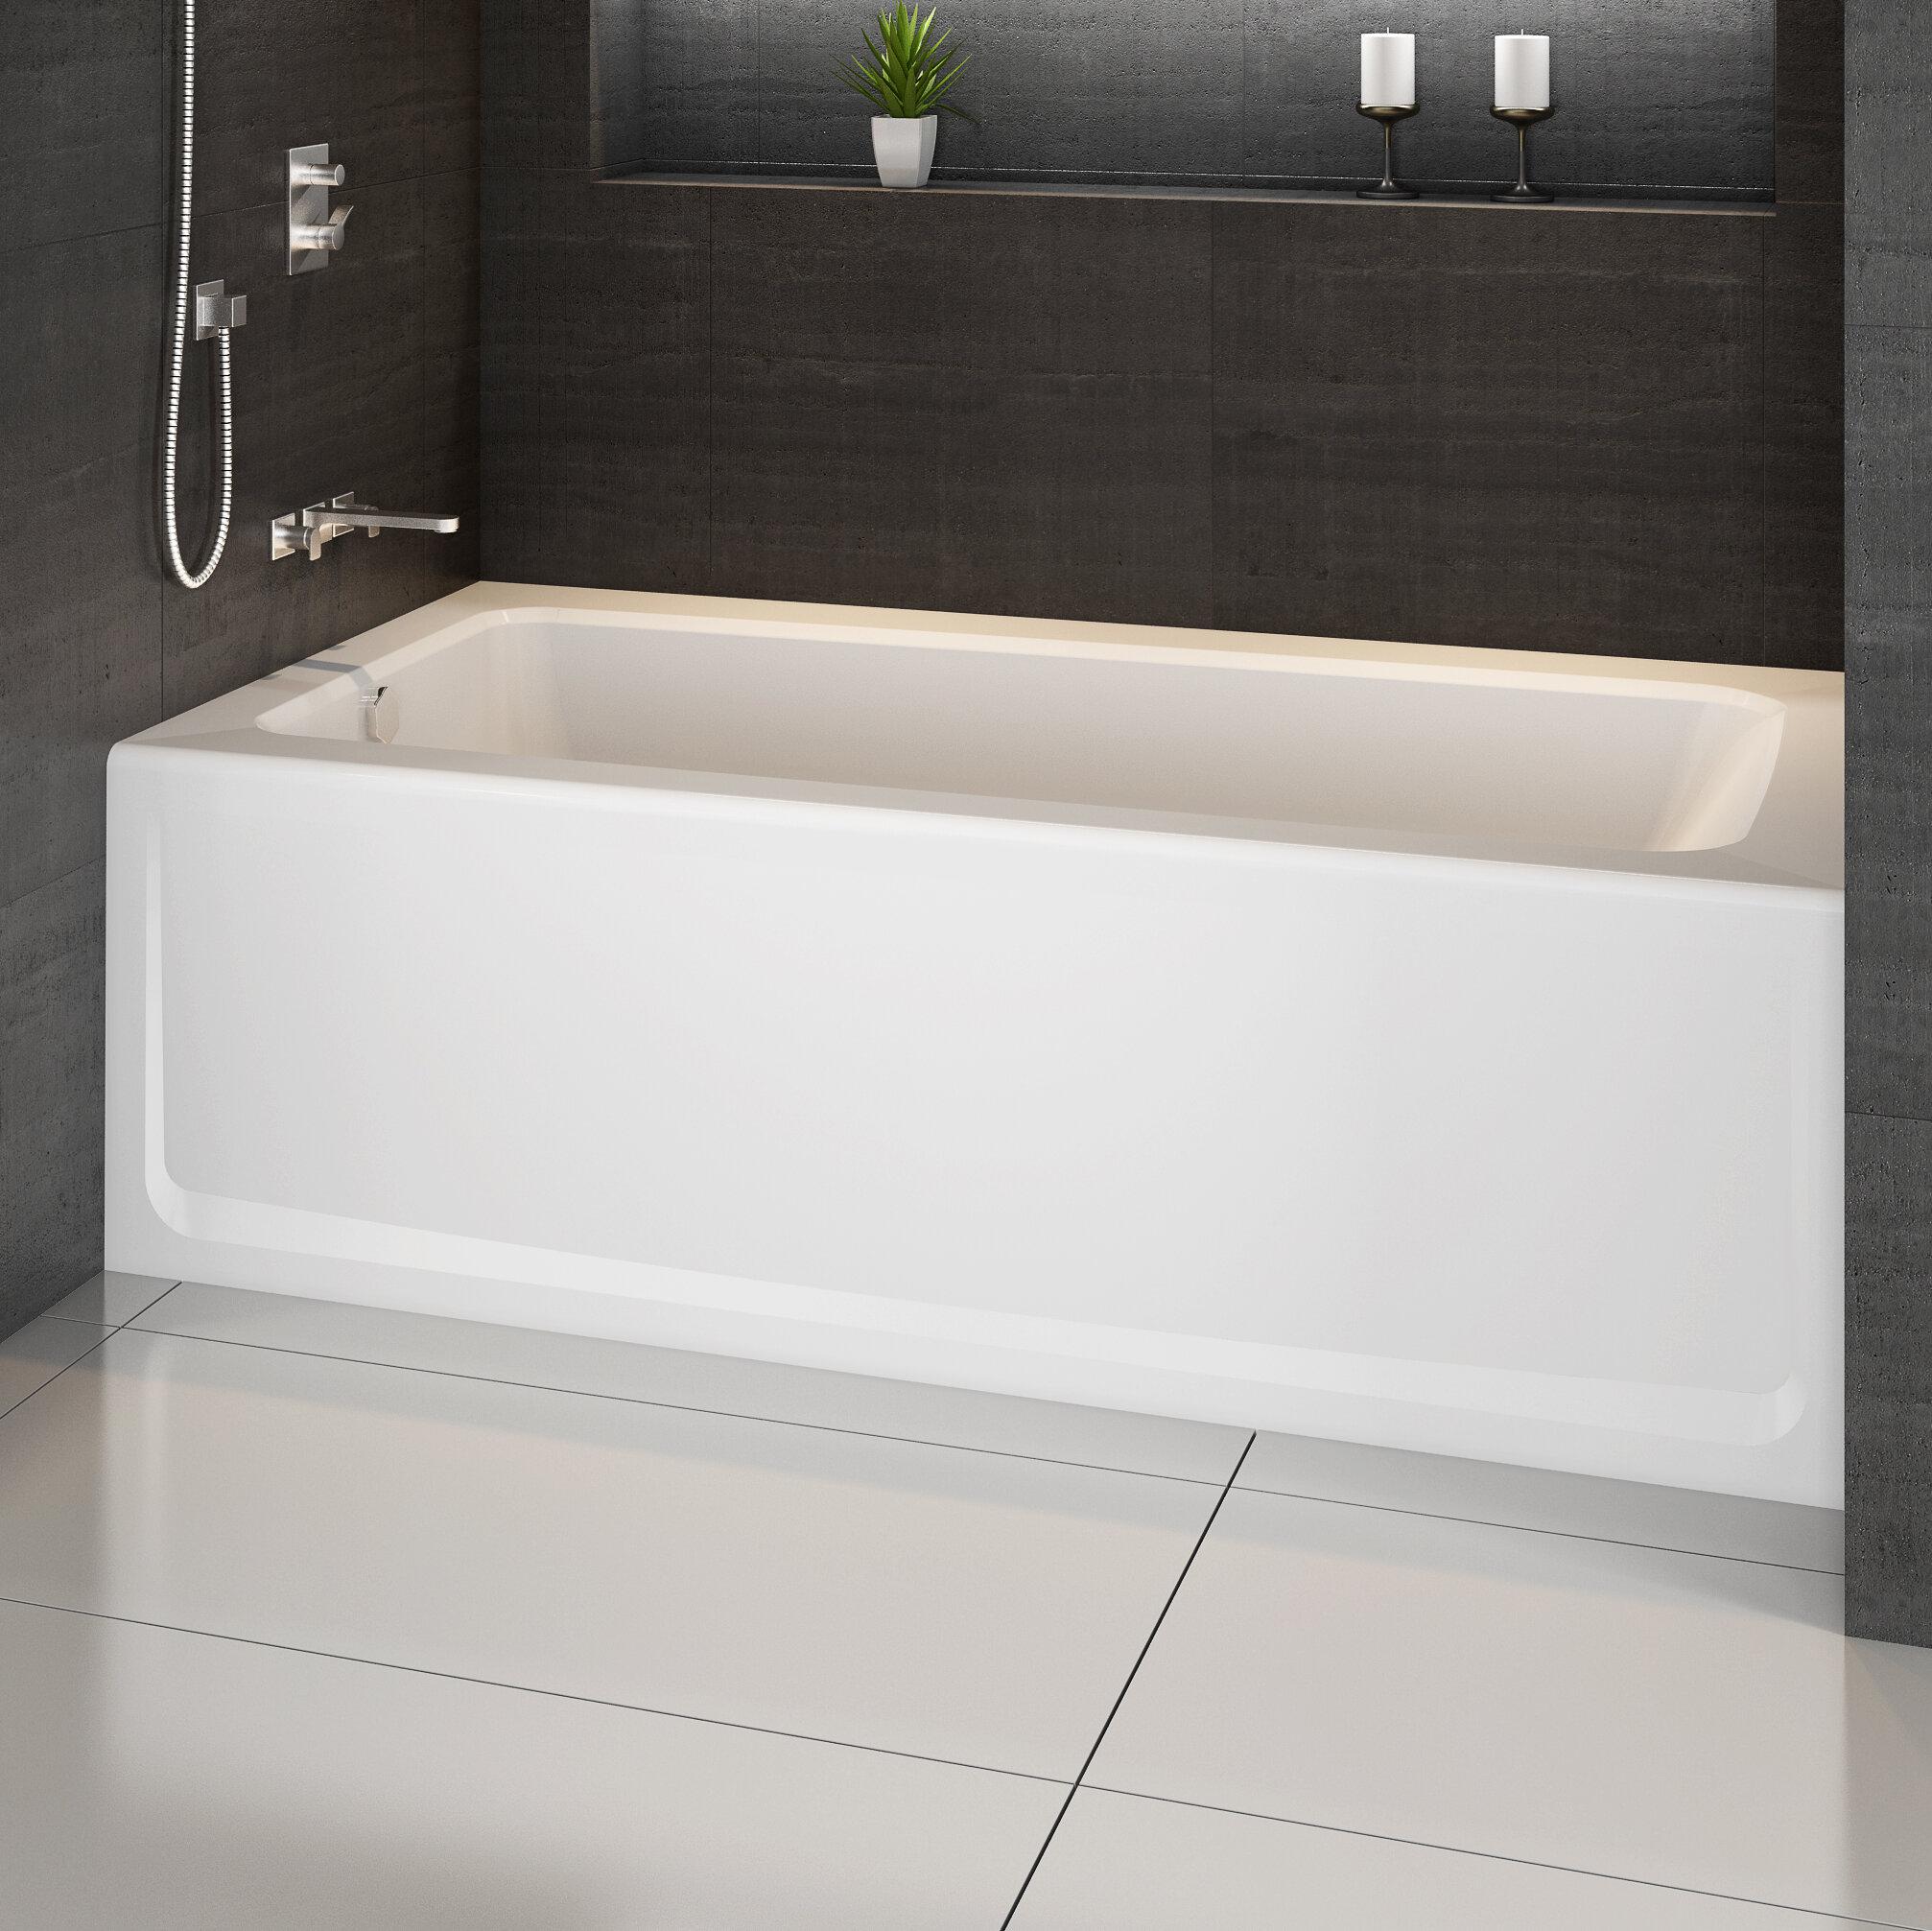 Signature 60 X 32 Alcove Bathtub In Skirted Soaking